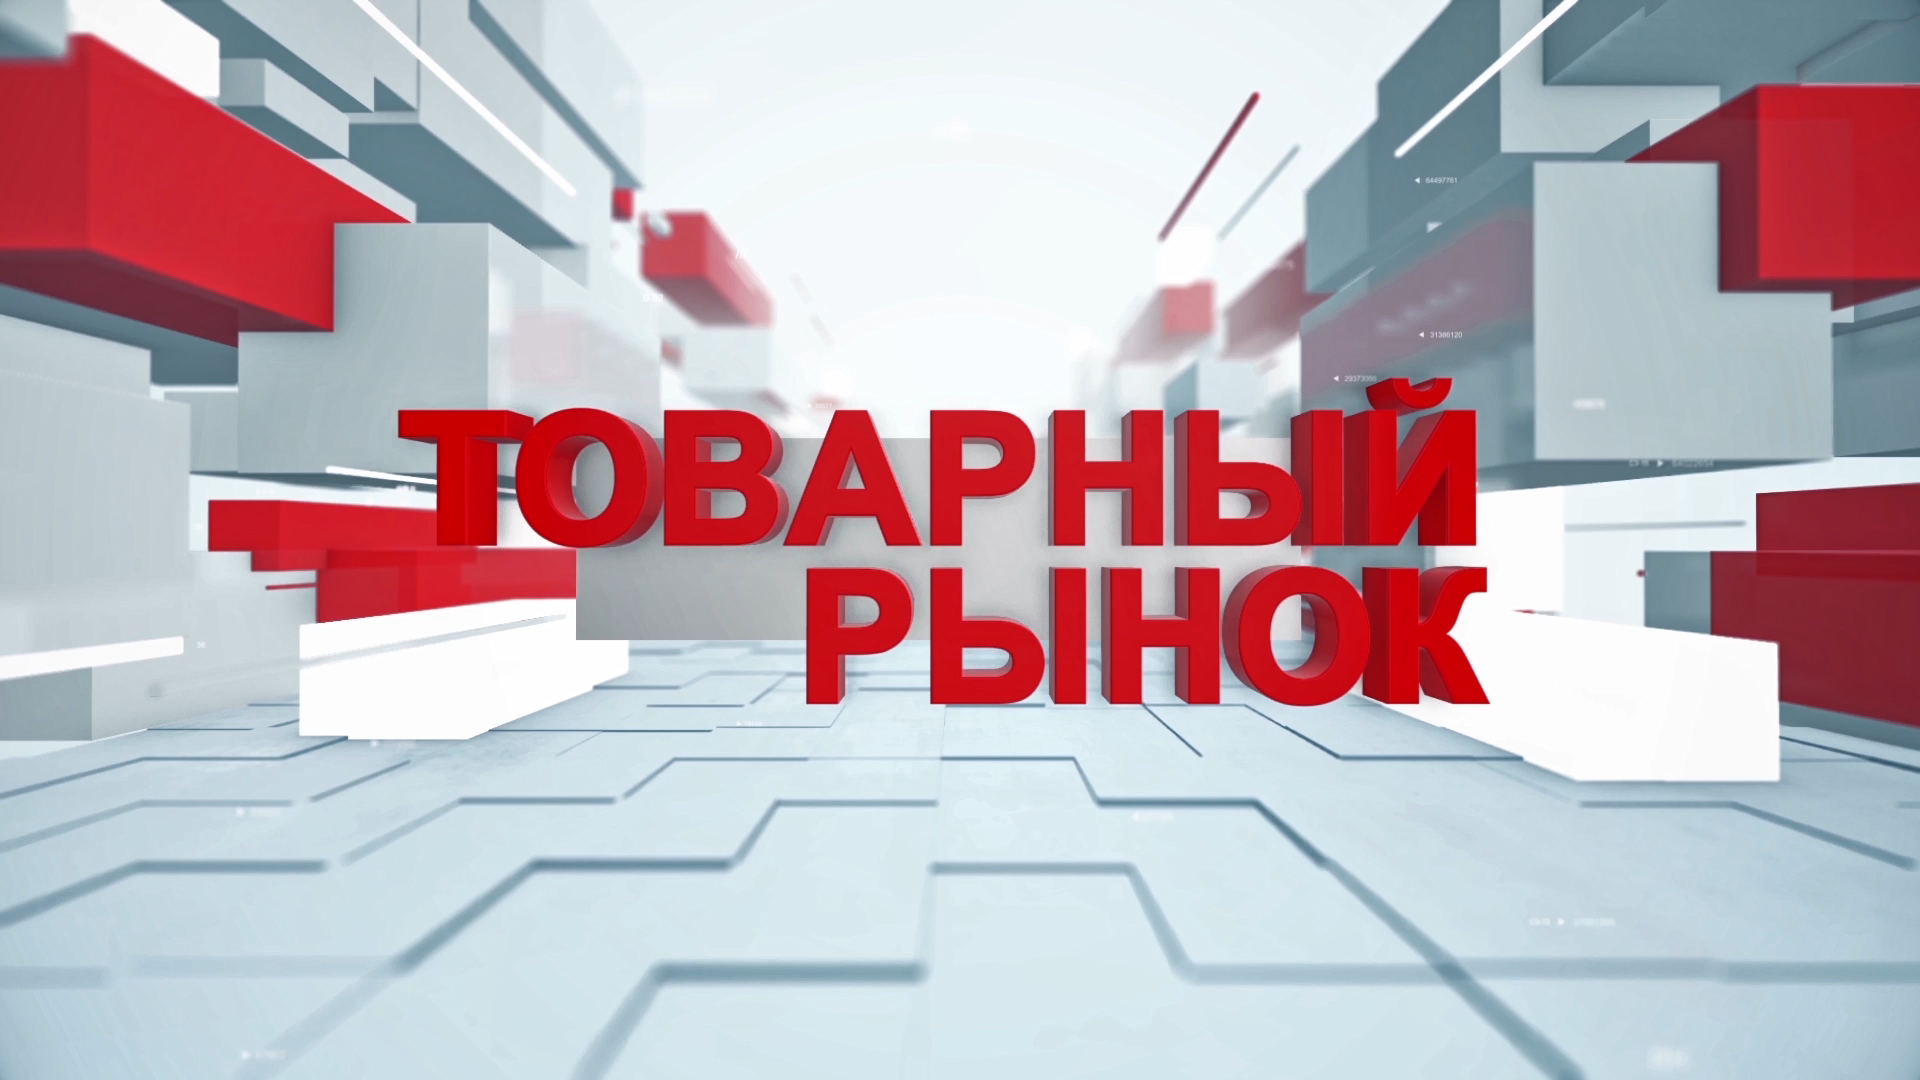 https://inbusiness.kz/ru/images/original/19/images/tBE3Zsim.png